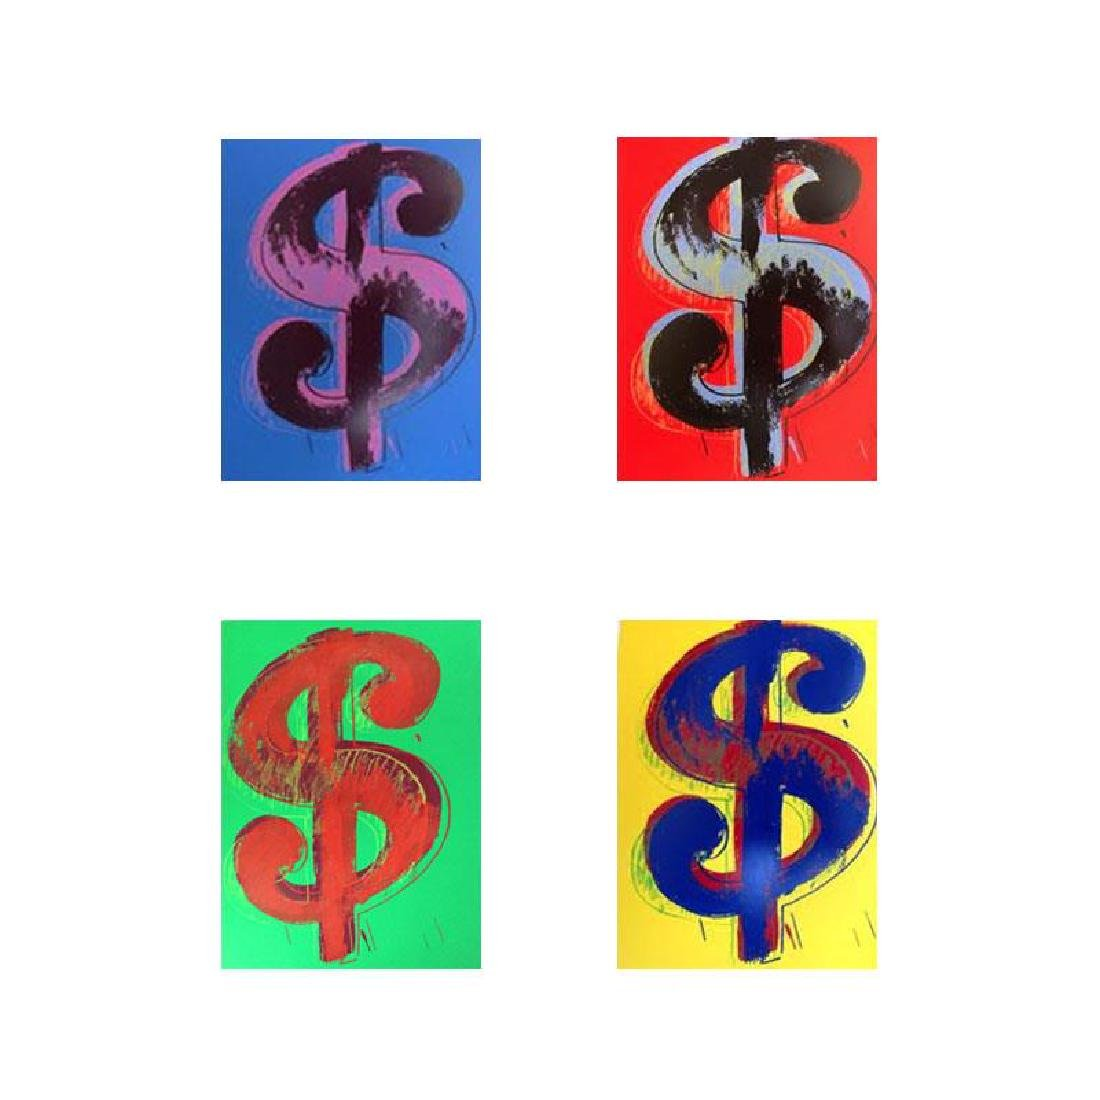 $ (Dollar signs) by Warhol, Andy